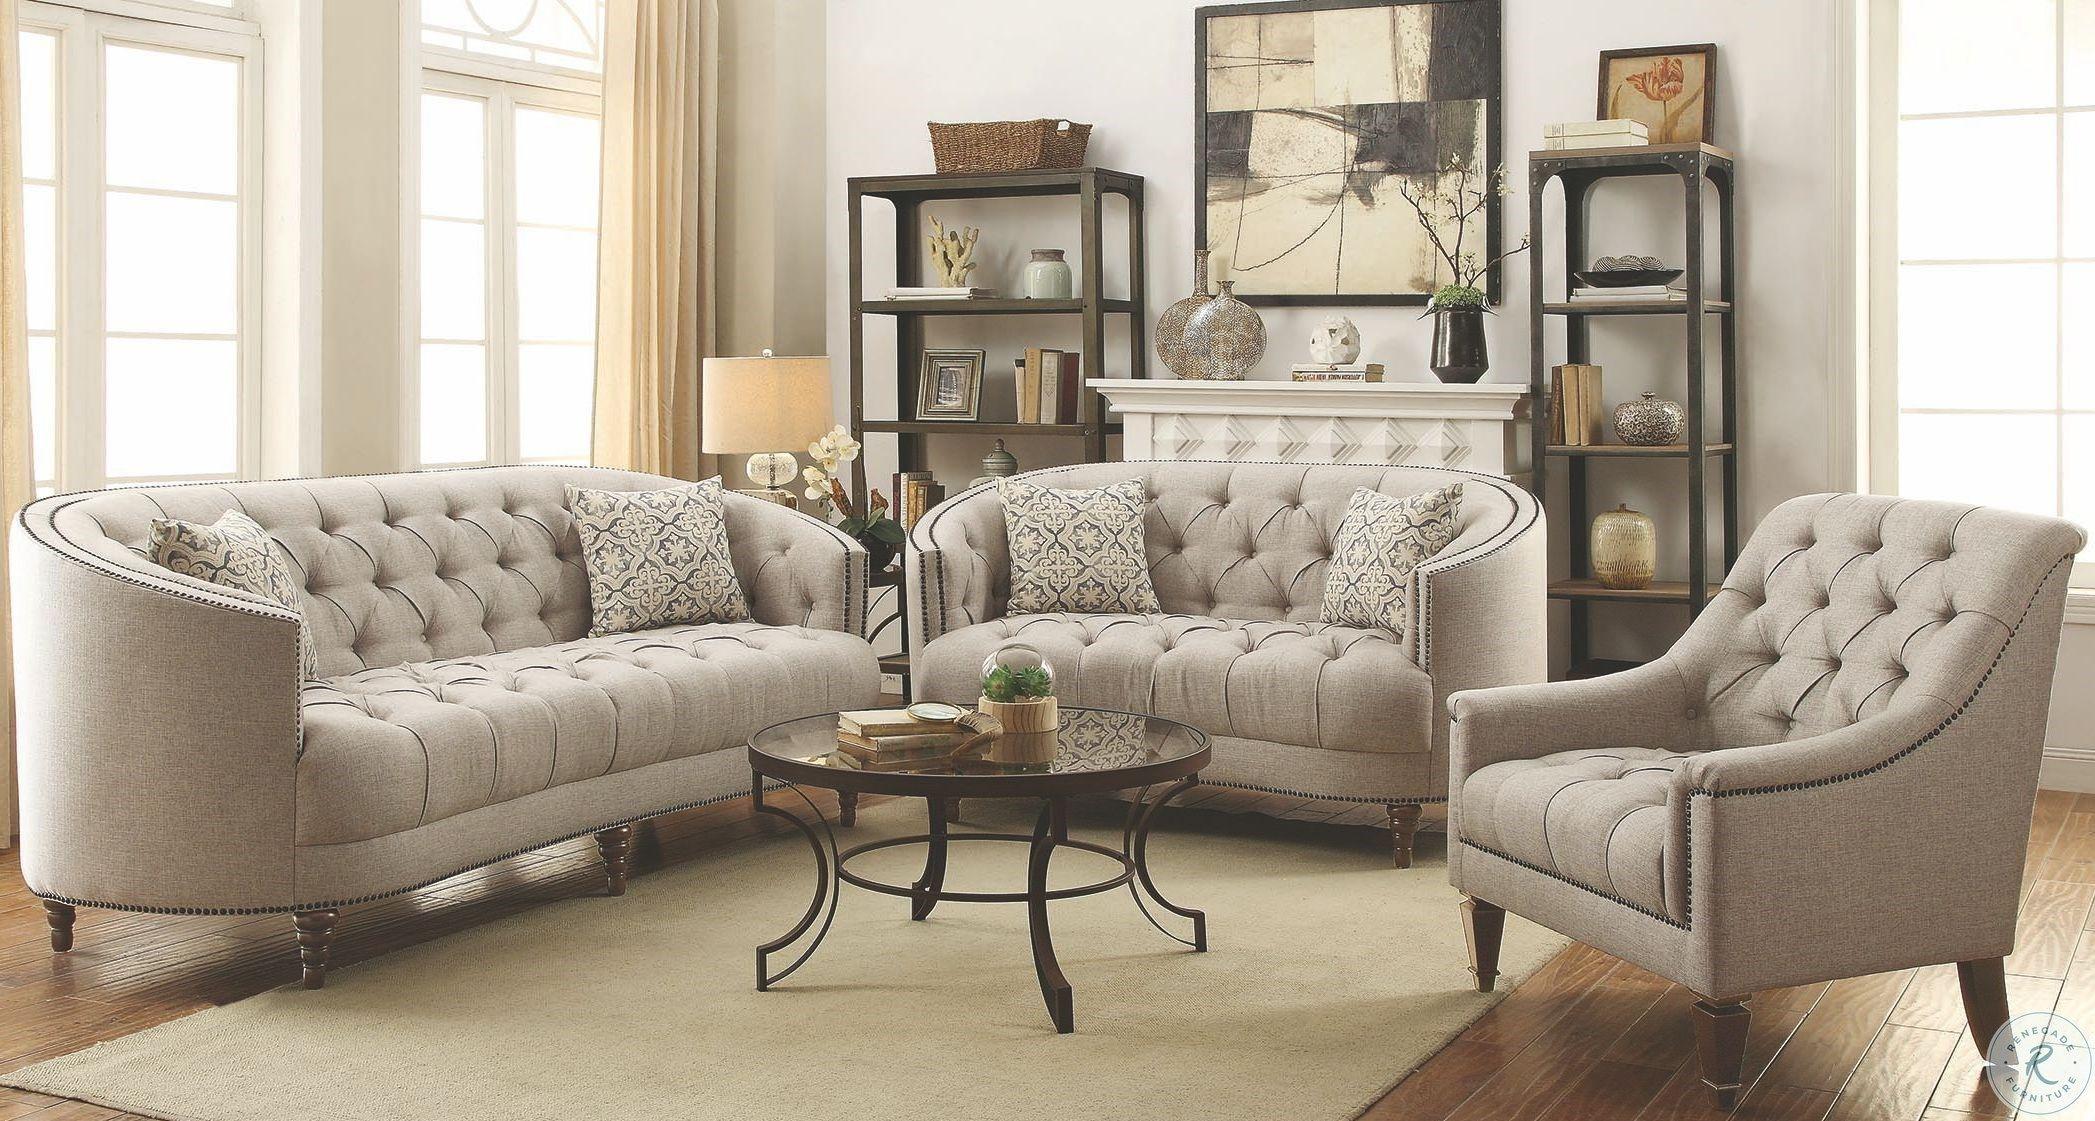 Avonlea Grey Loveseat In 2020 Living Room Sets Grey Living Room Sets Living Room Grey